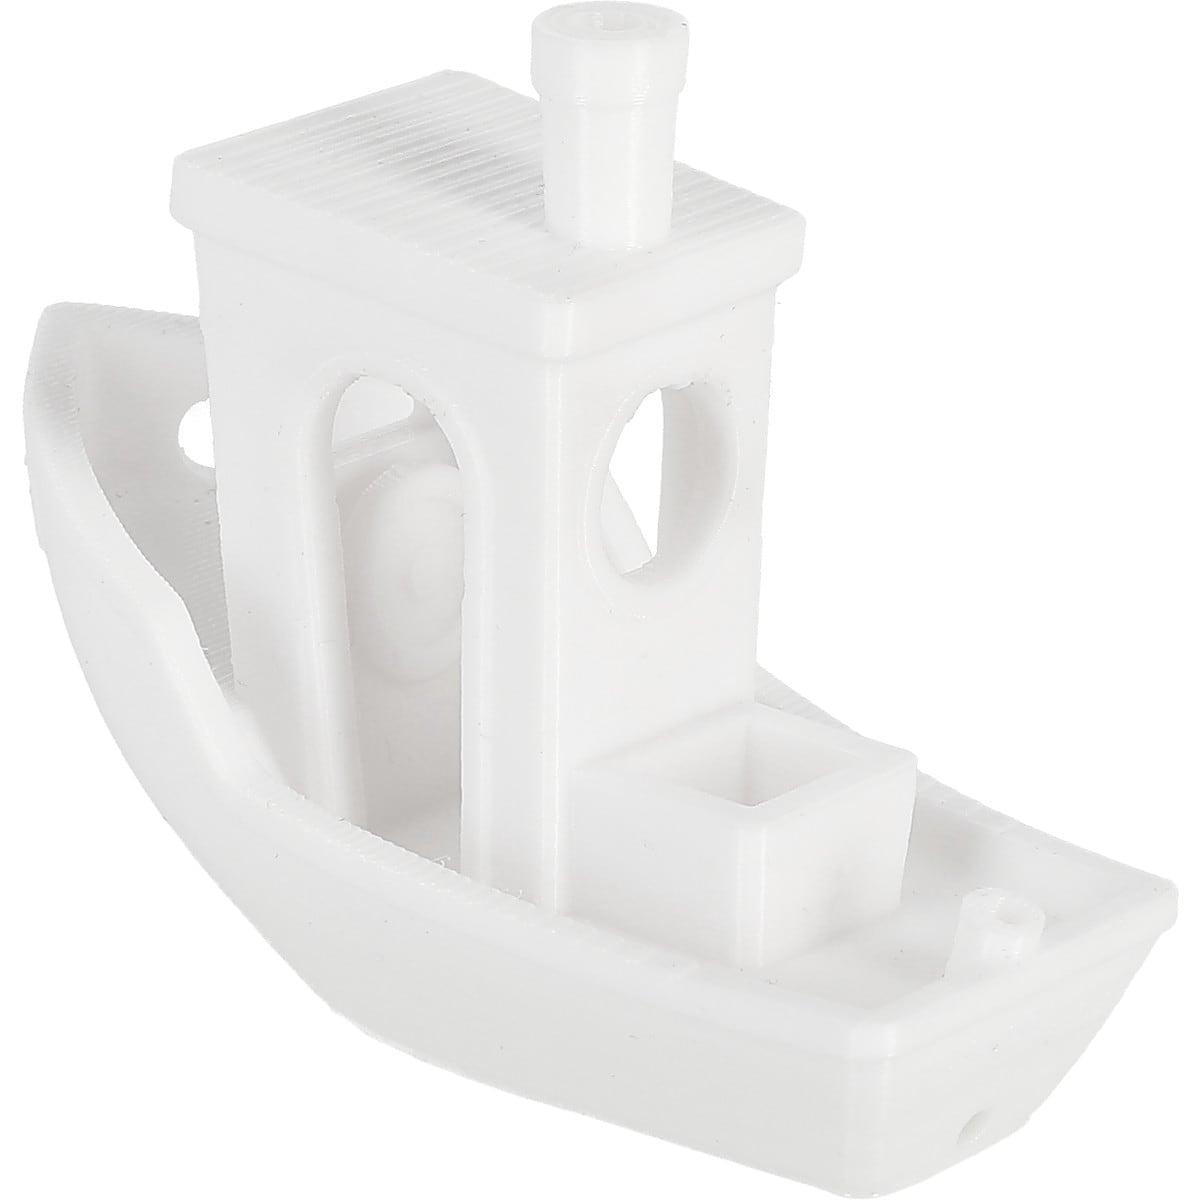 PETG-filamentti 3D-tulostimeen, Clas Ohlson